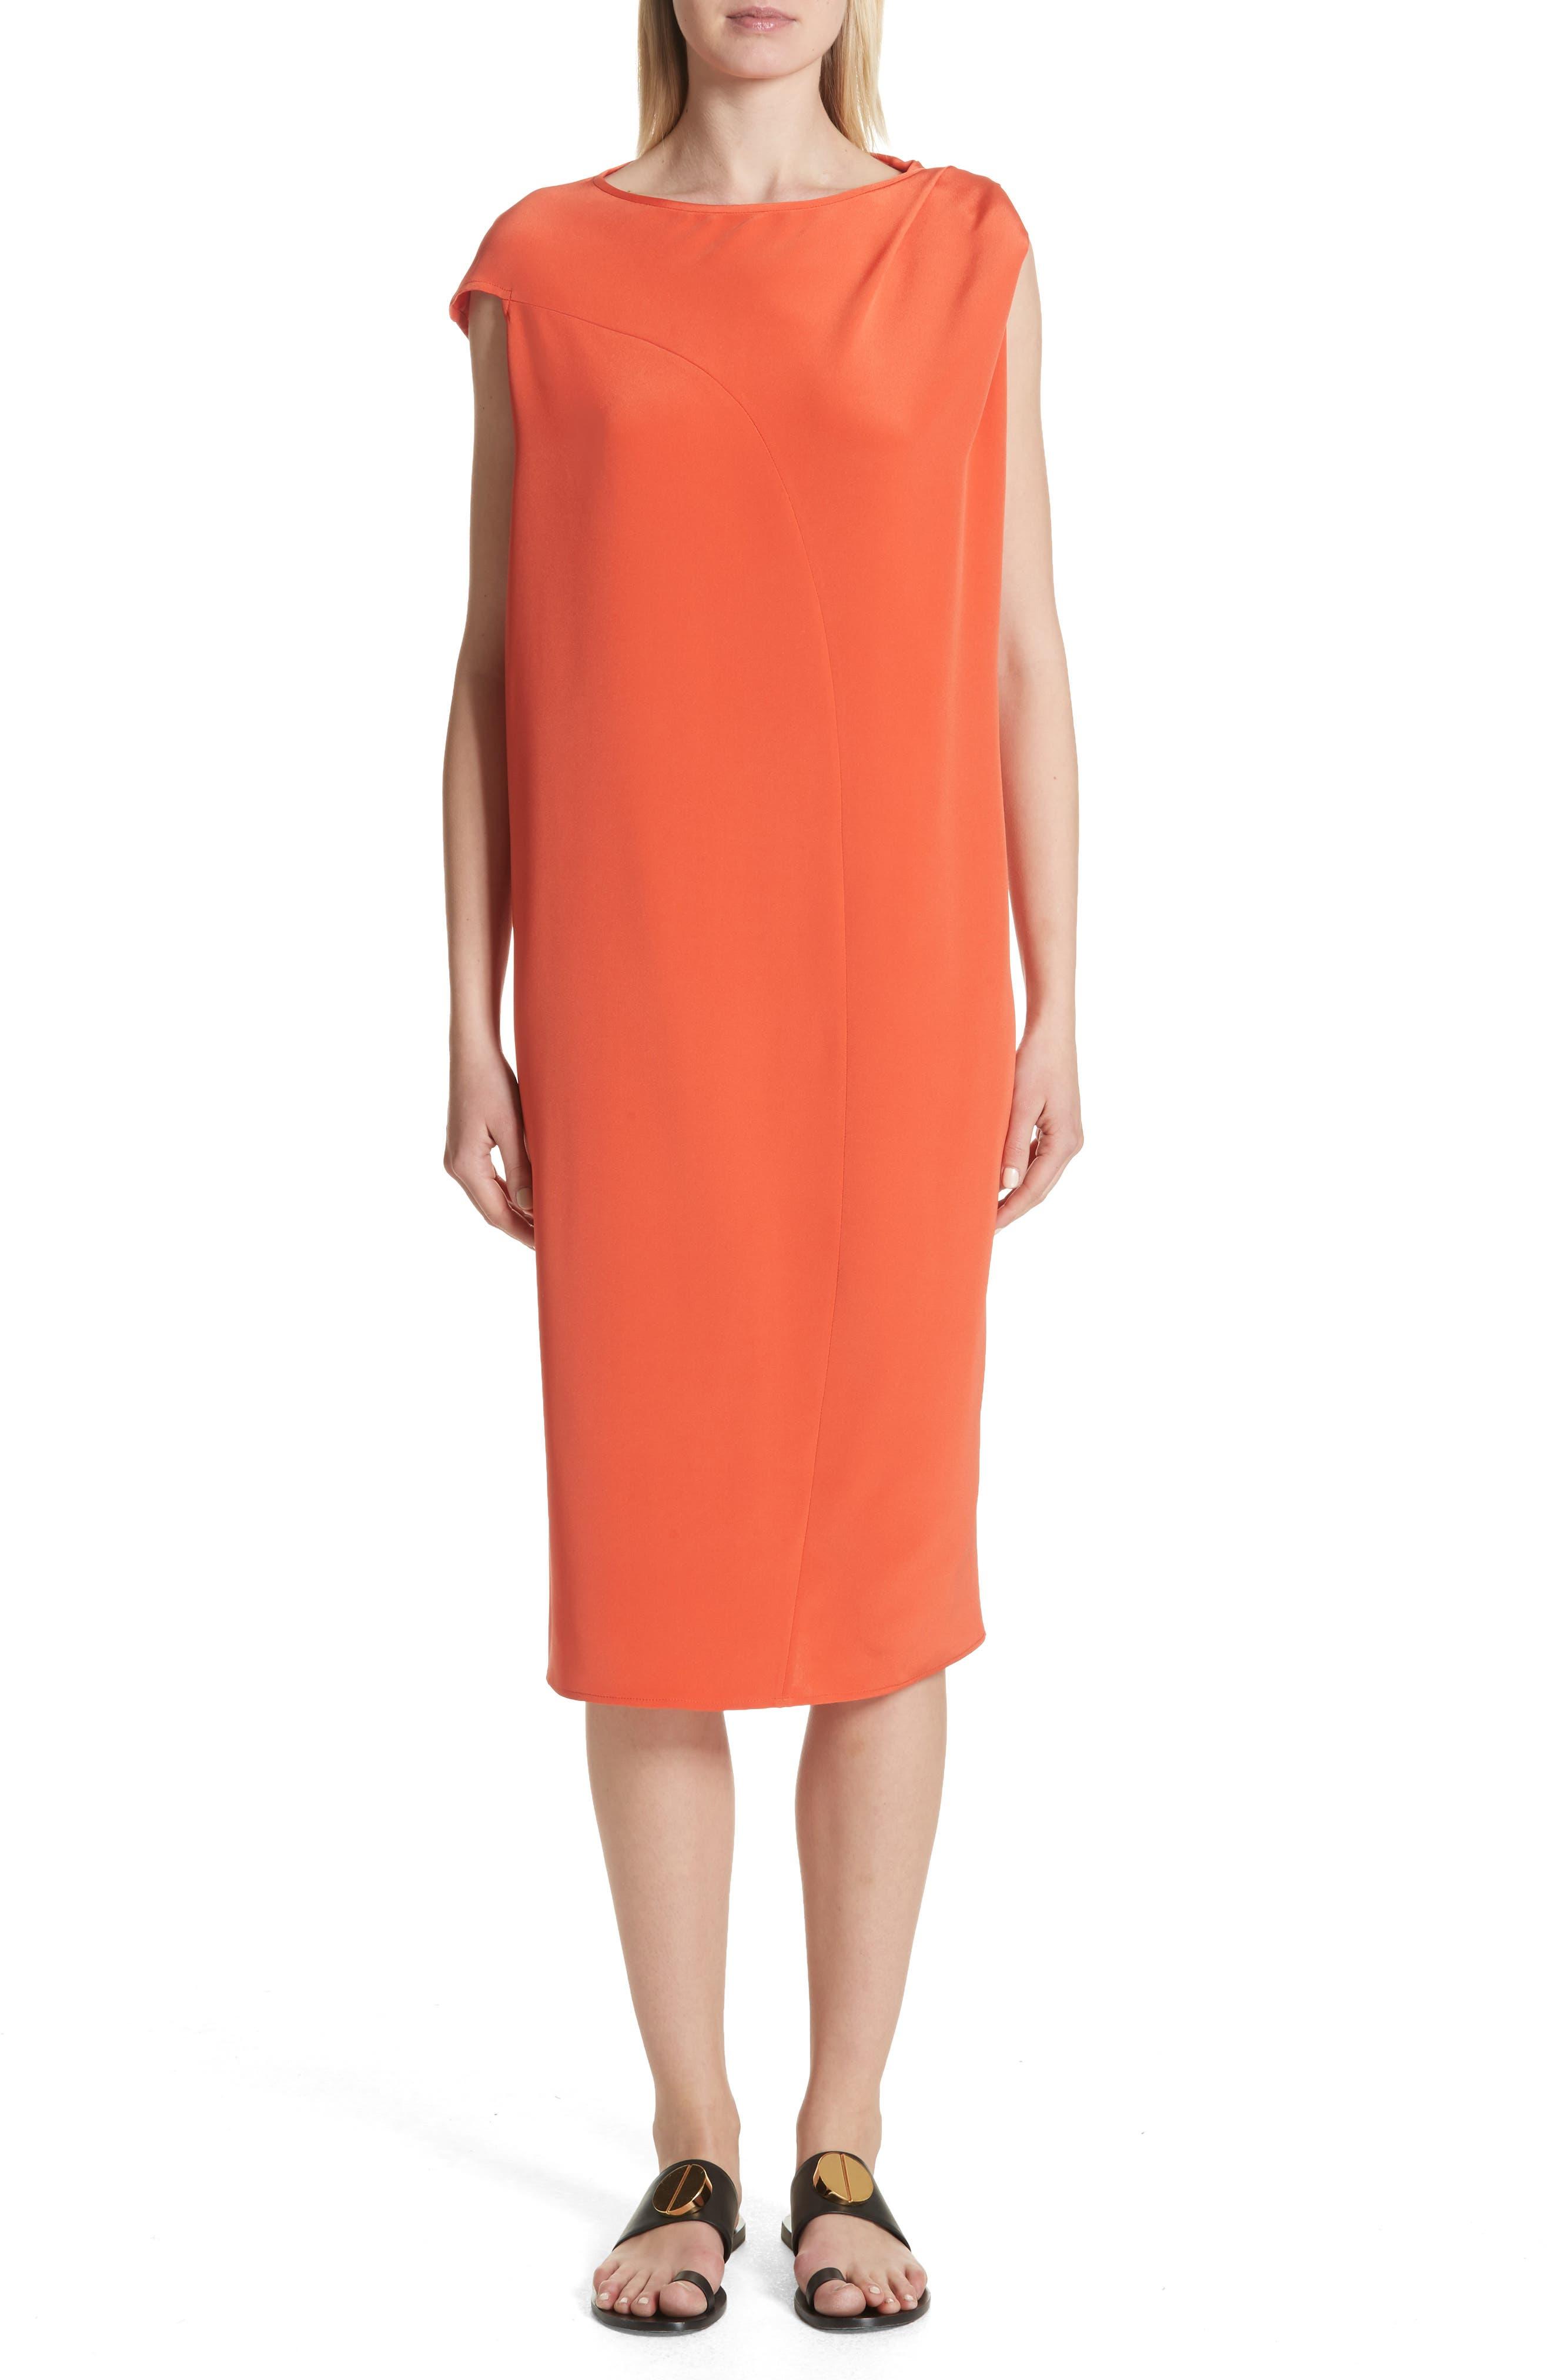 Twist Detail Silk Dress,                         Main,                         color, Persimmon Orange